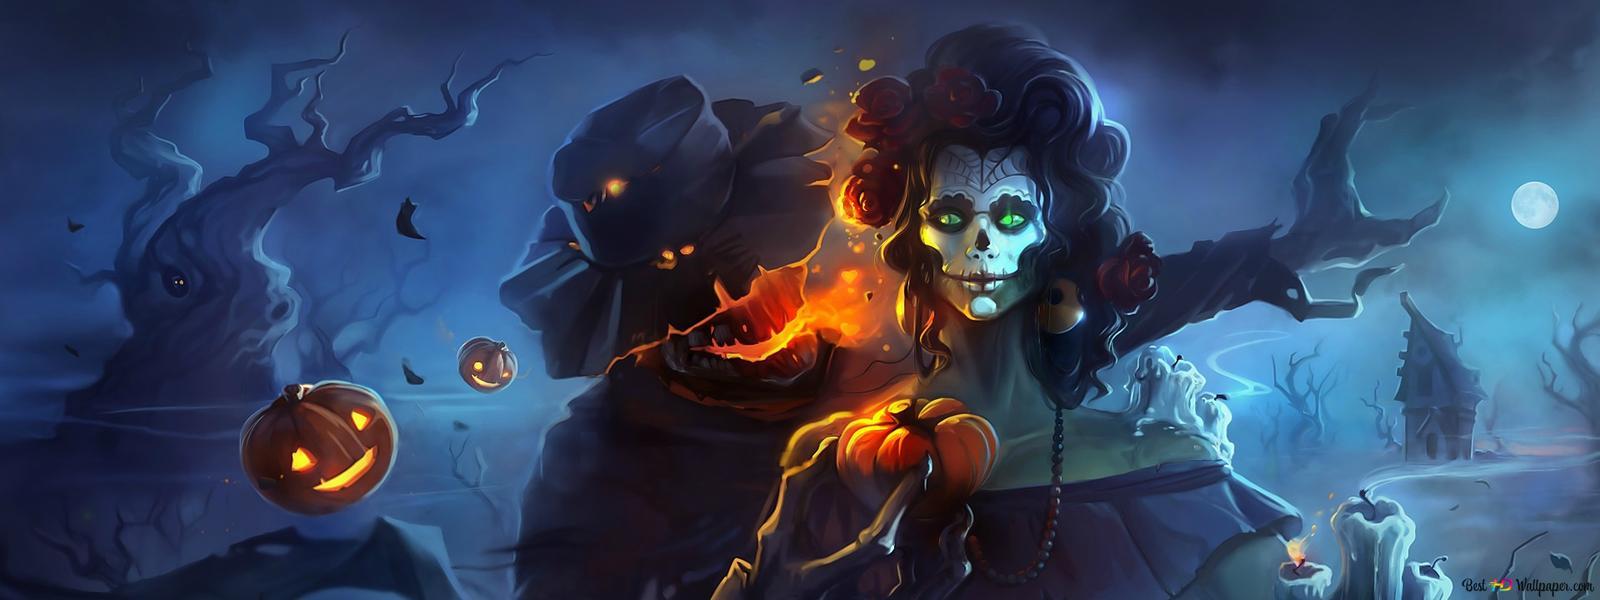 Spooky Halloween Hd Wallpaper Download